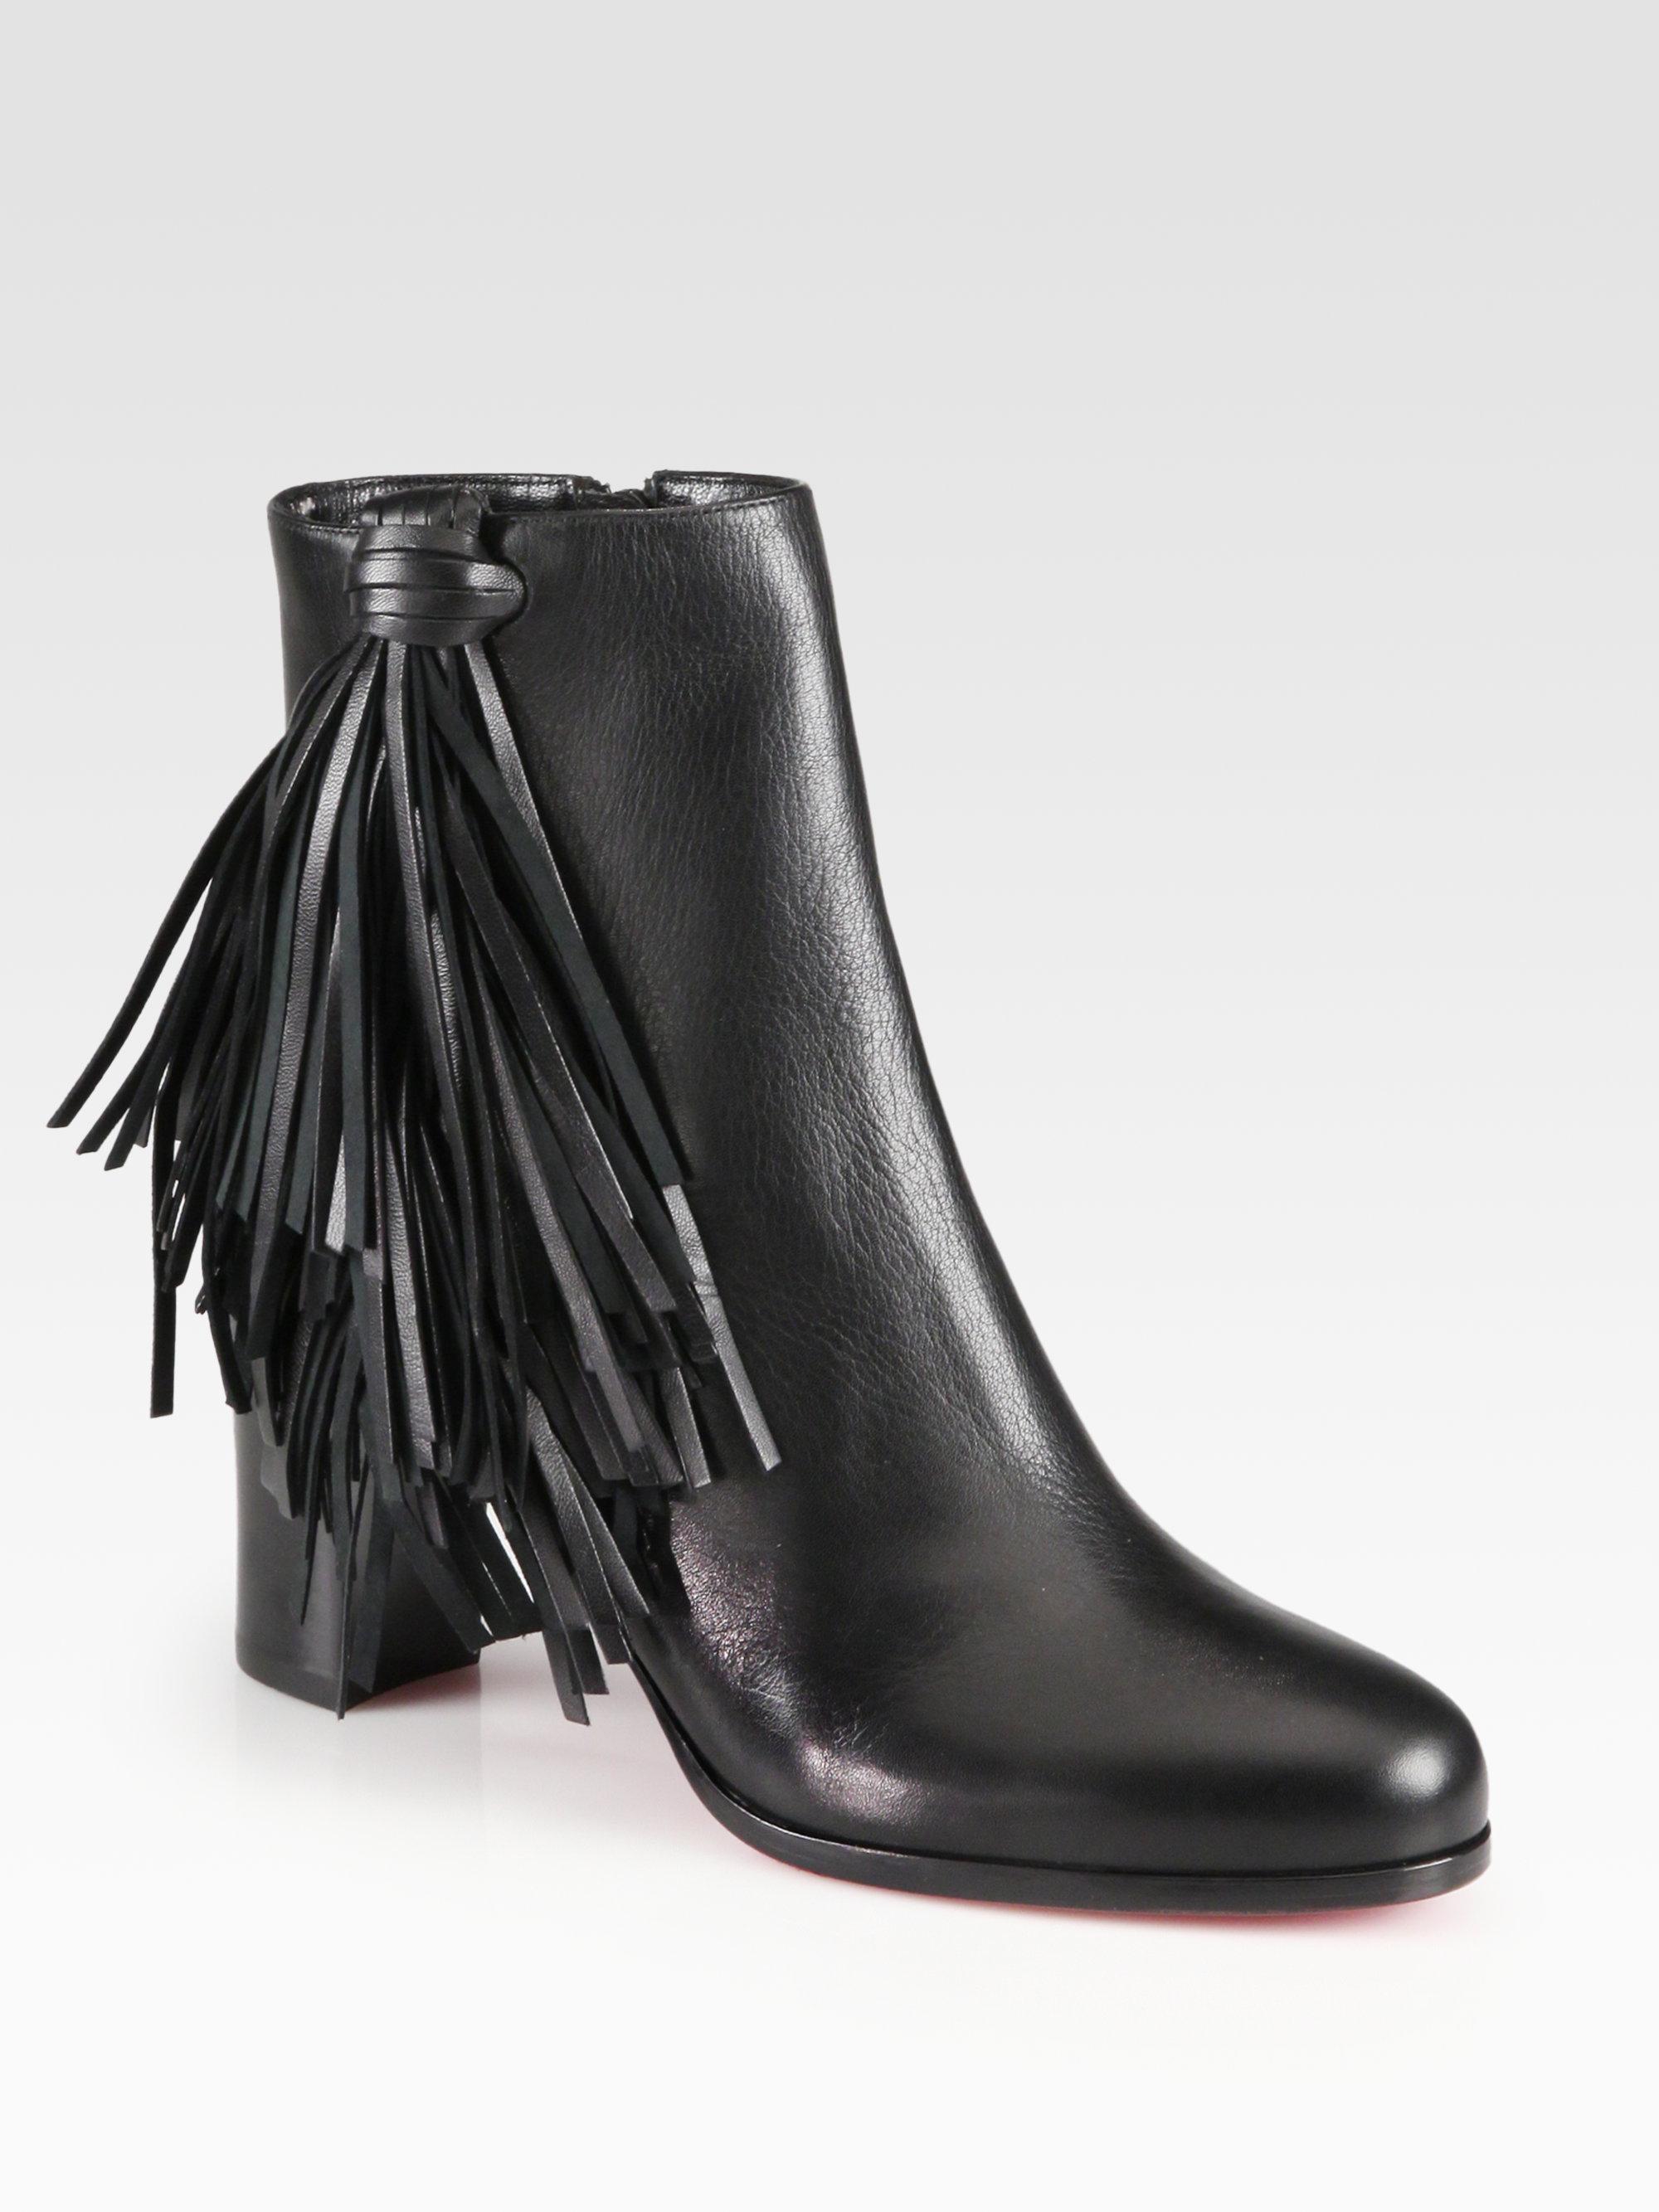 new style 403ba 34768 Christian Louboutin Black Jimmynetta Fringe Leather Ankle Boots